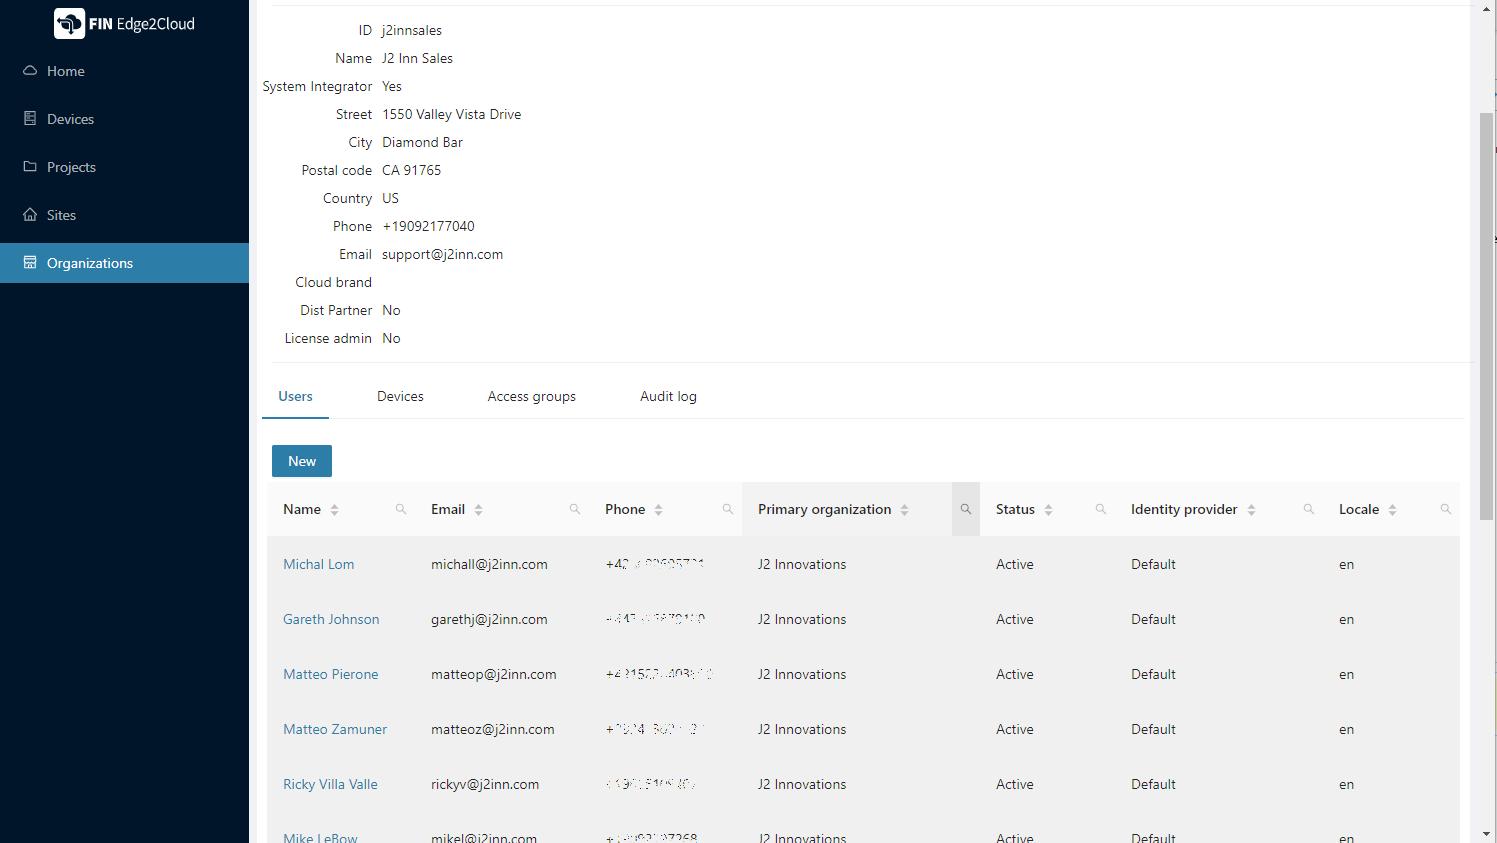 2021-01-20 11_01_31-Inbox - Google Workspace - chrisi@j2inn.com - Outlook